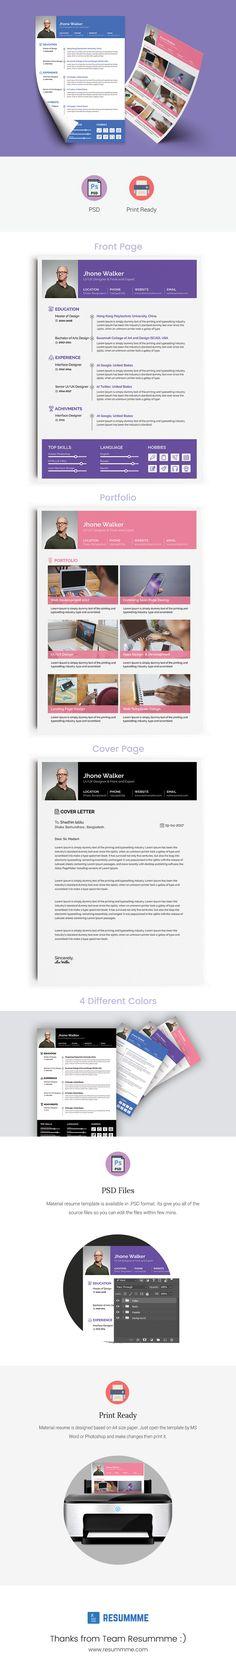 Pin by Resummme on Free resume templates Pinterest Resume - print free resume